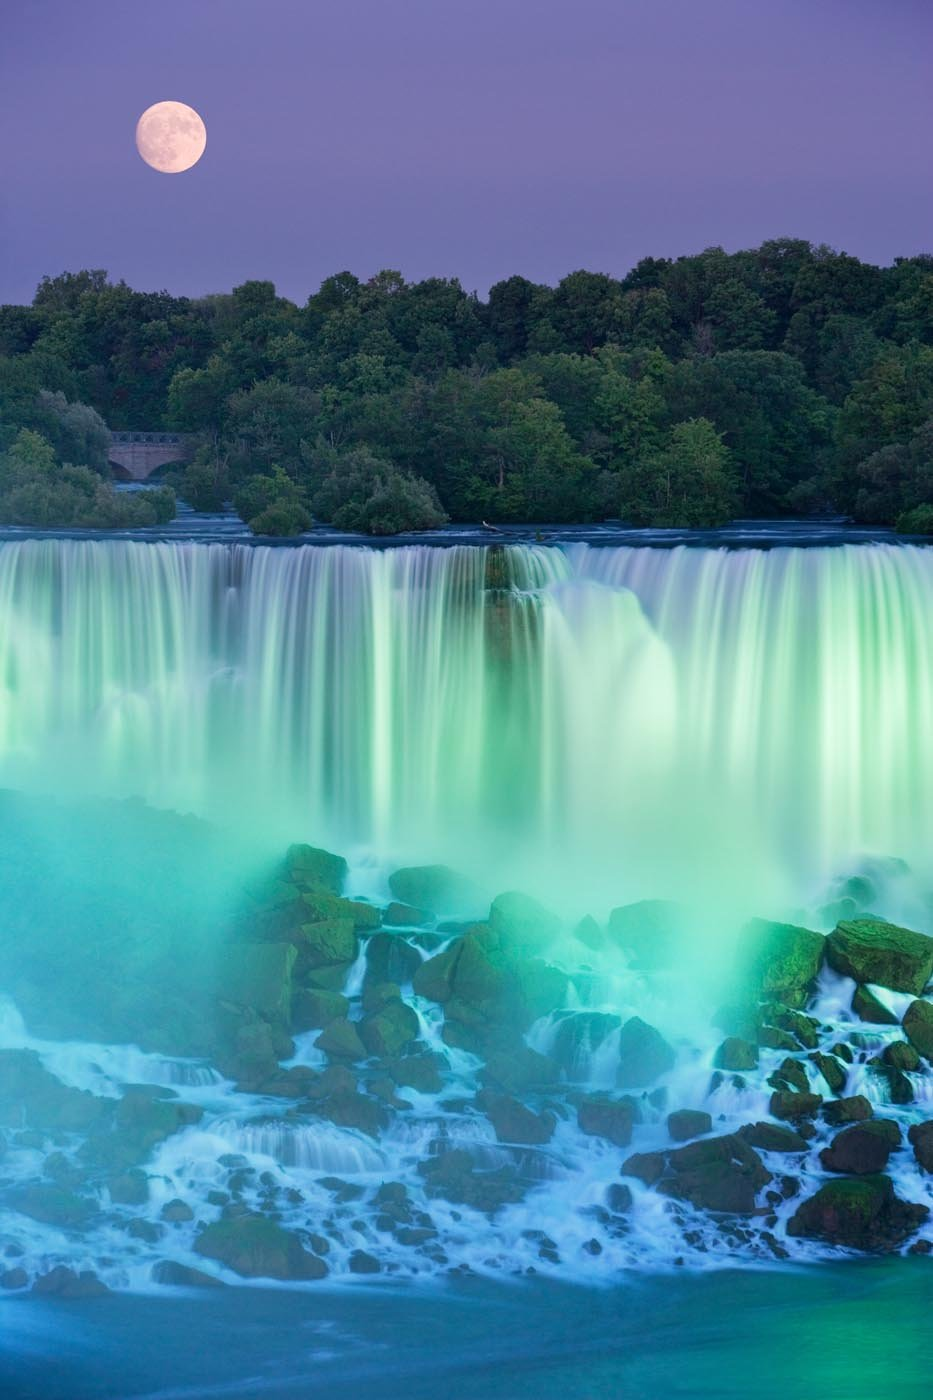 The American Falls, near Niagara Falls, Canada